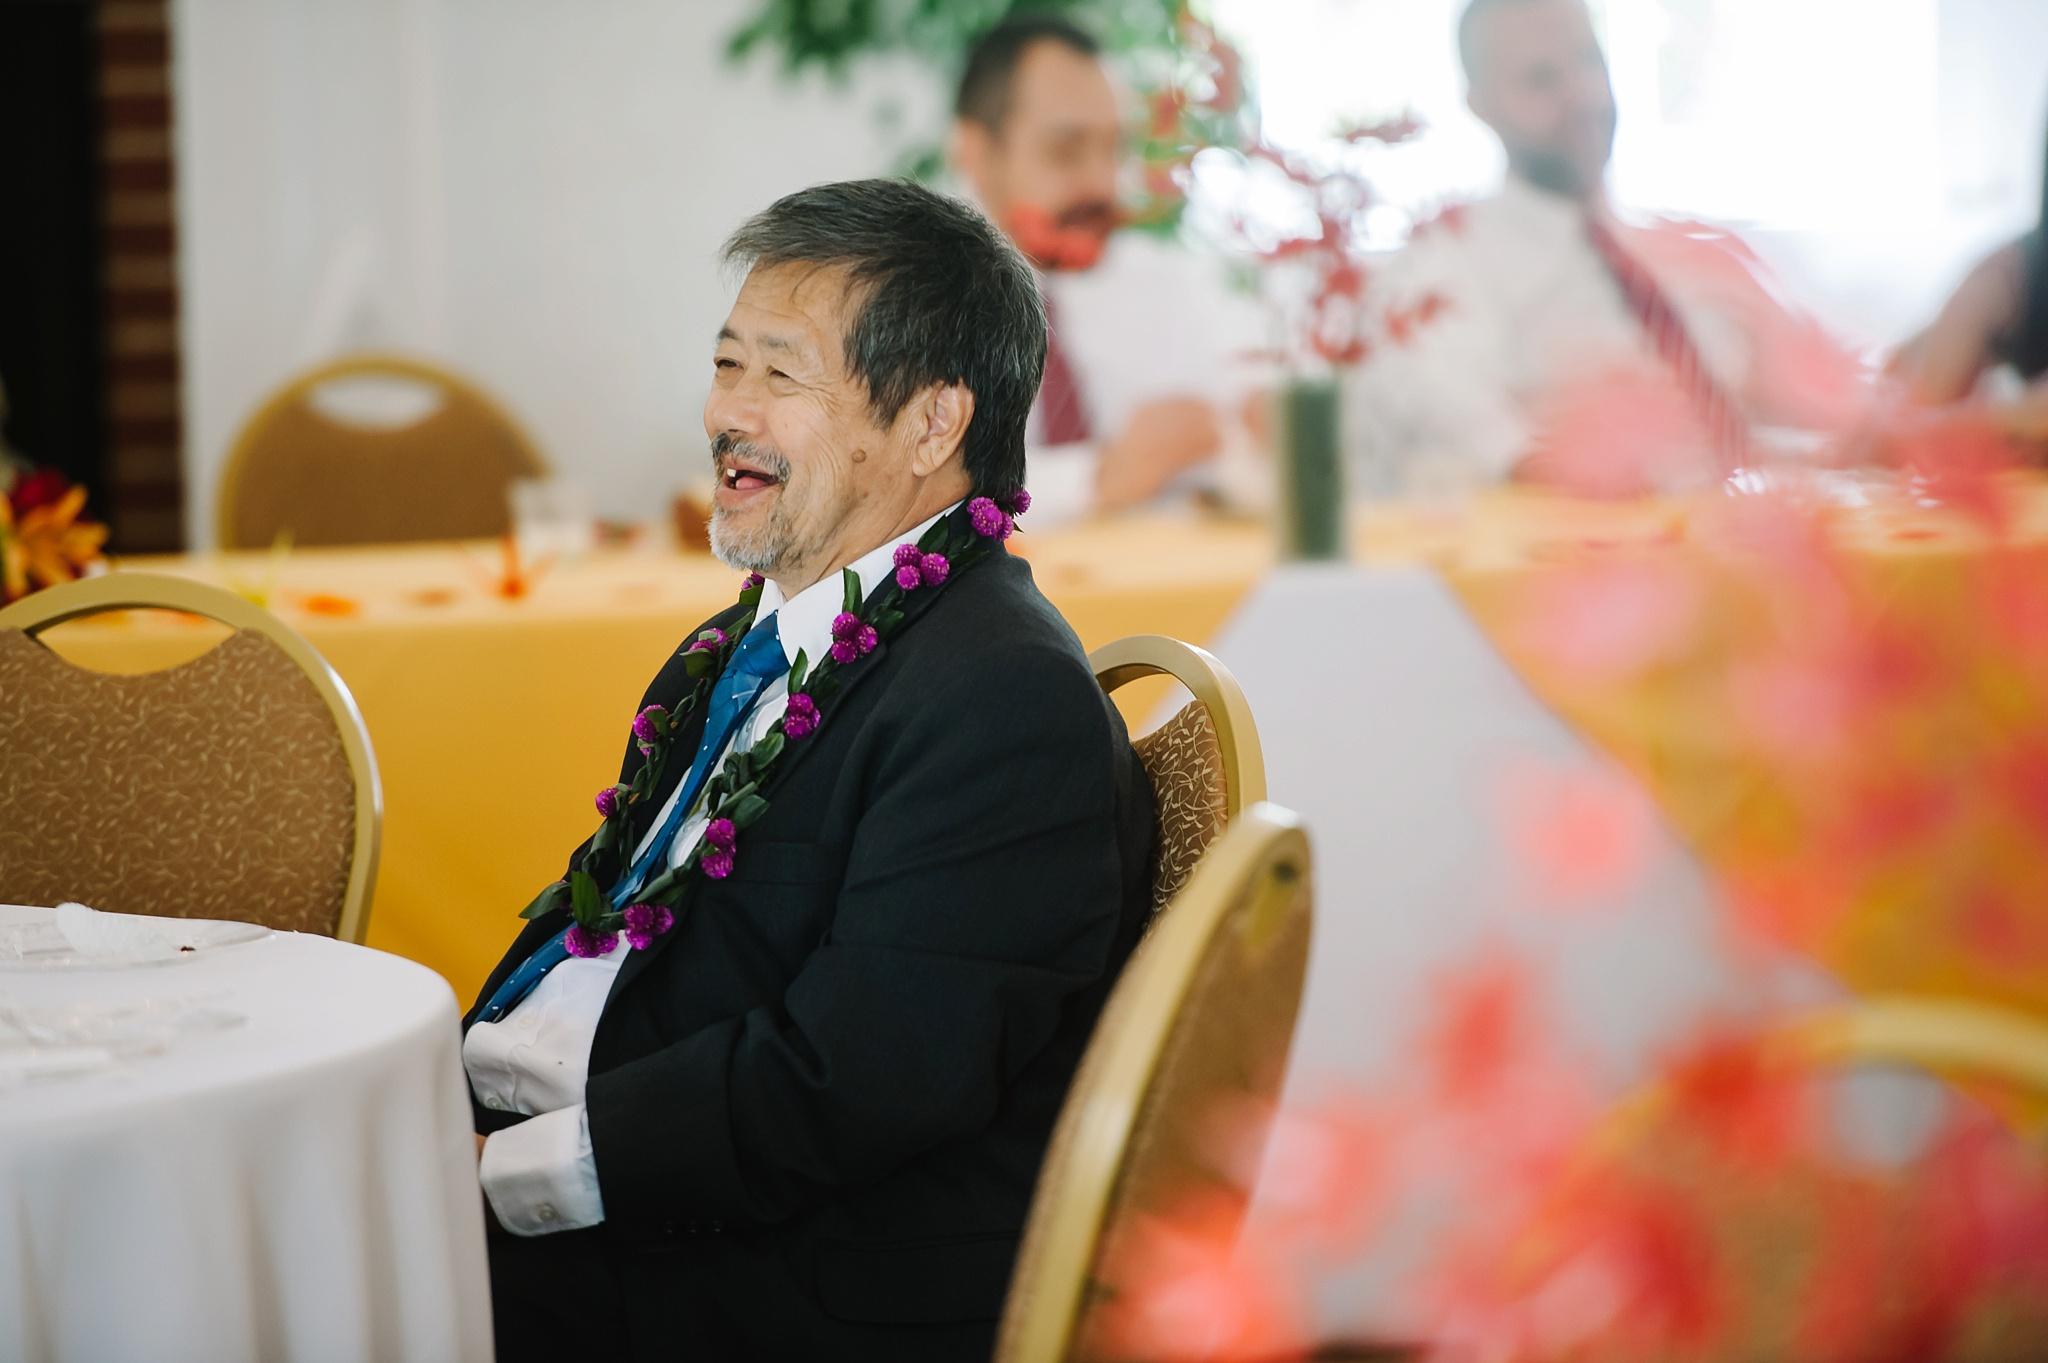 Park City Wedding Photographer Ali Sumsion 092